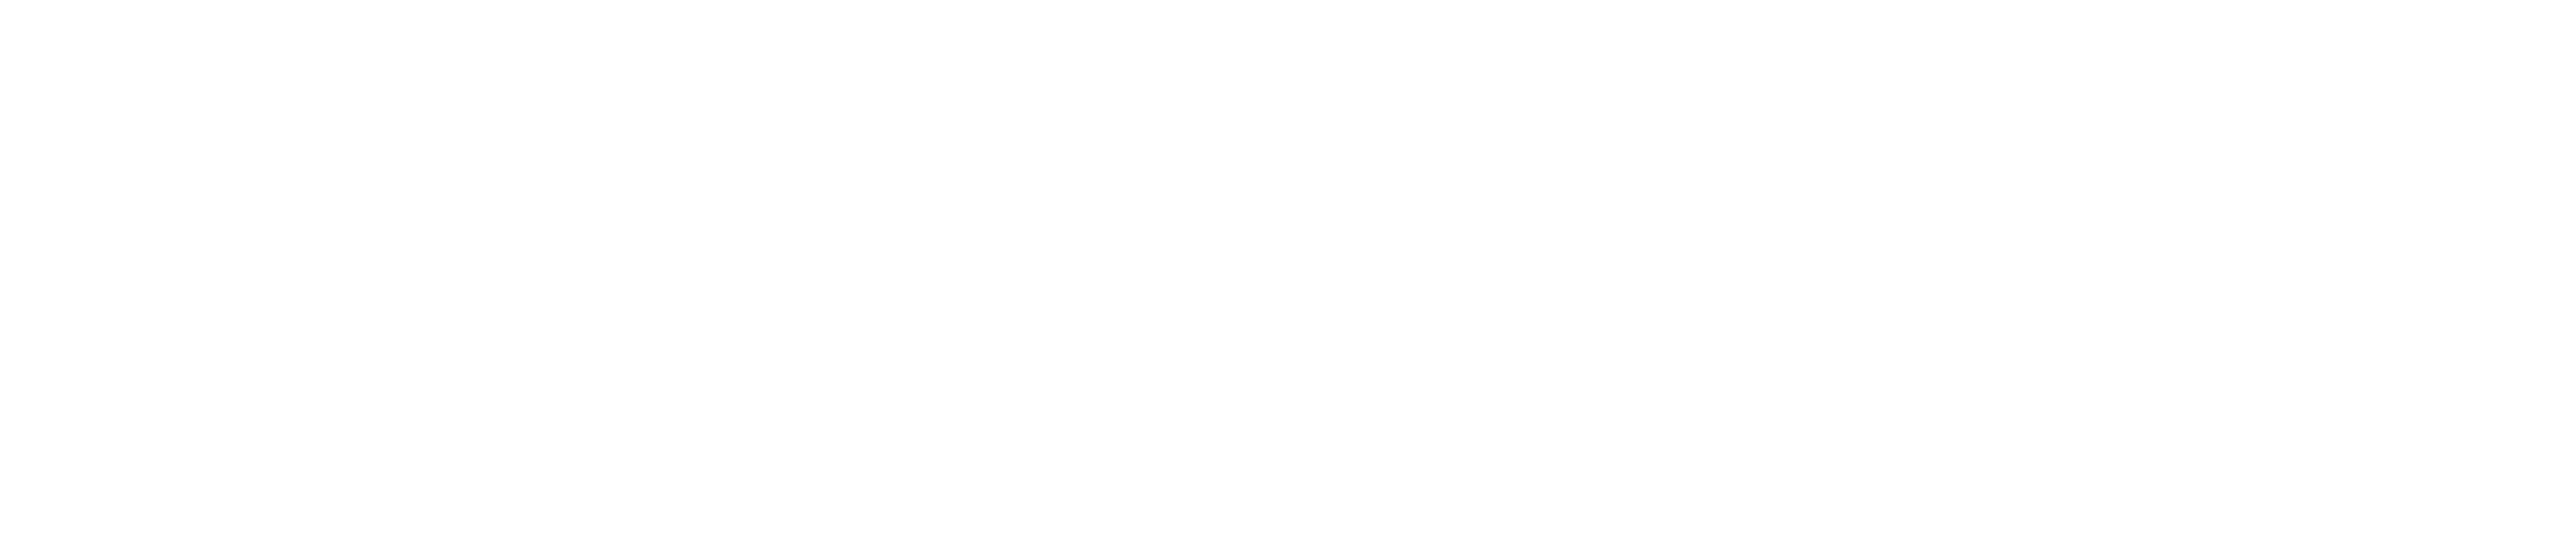 Novo Logo do PPGFIl - branco